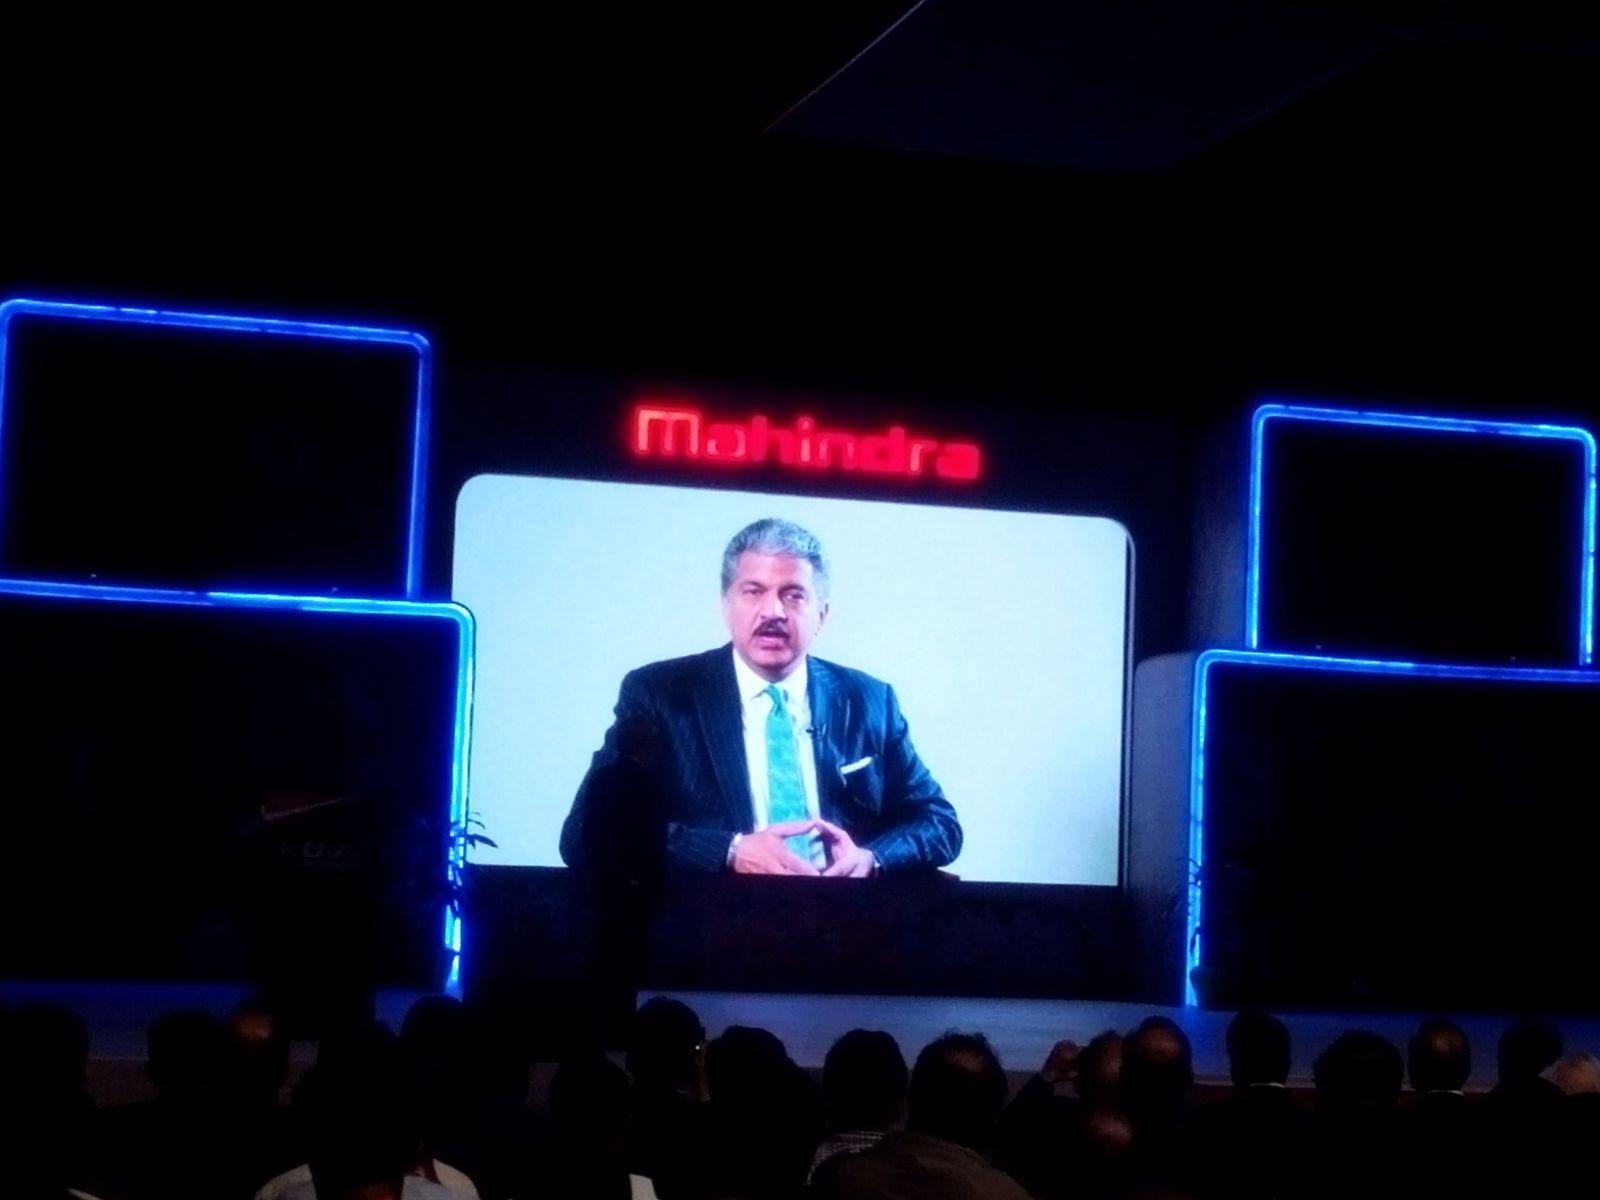 Mahindra KUV100 launch live (2)